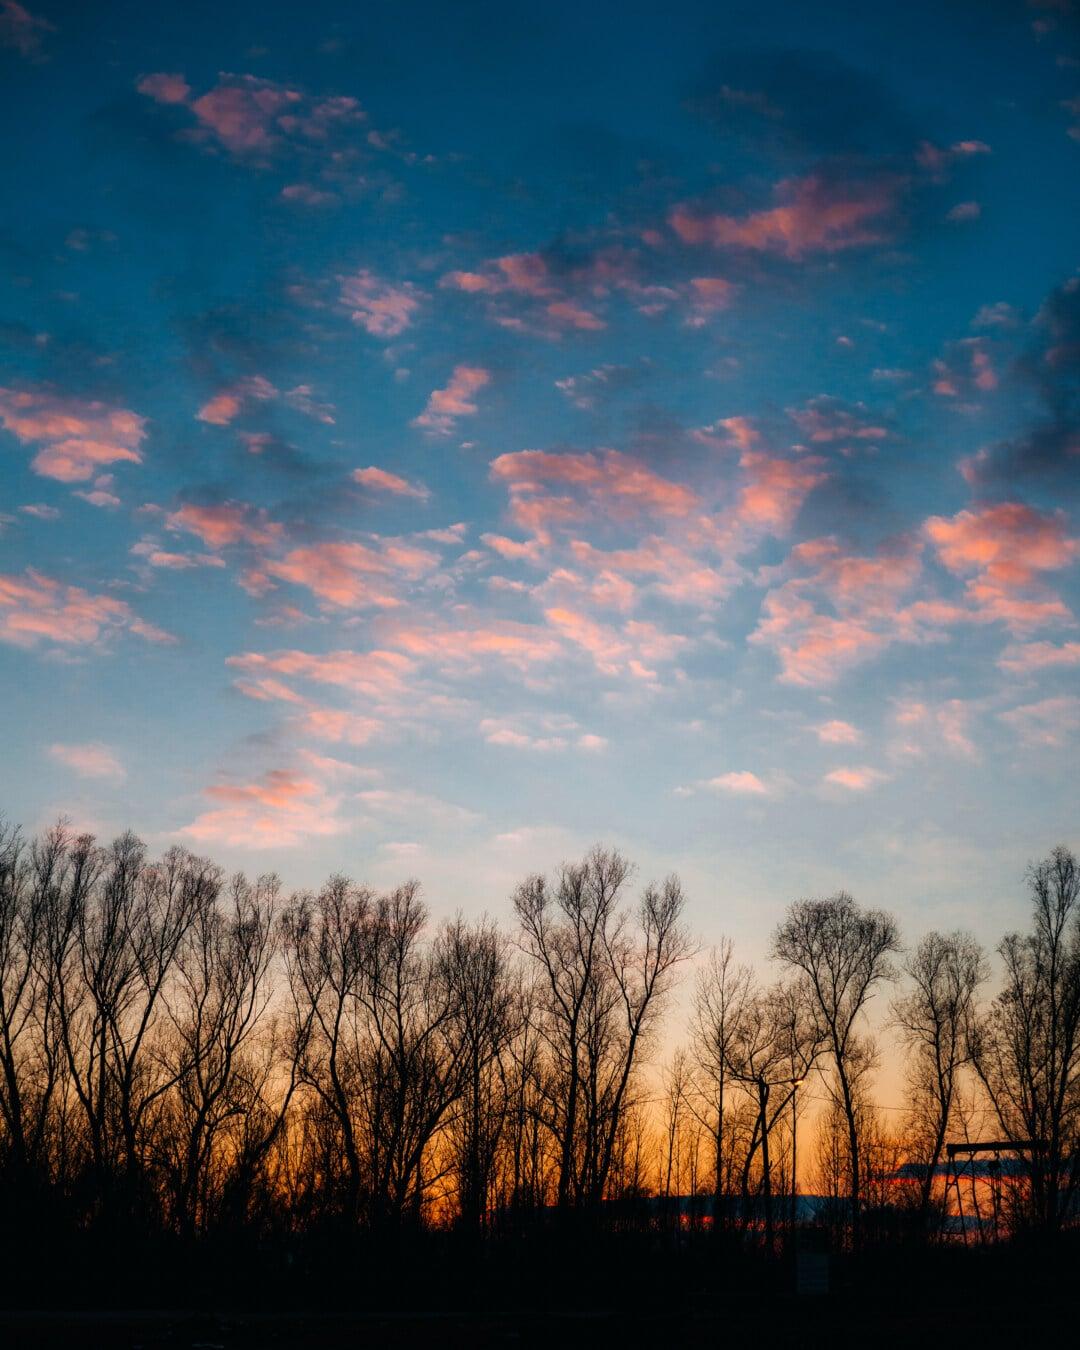 Morgen, Dämmerung, Atmosphäre, majestätisch, Wolken, Dämmerung, Landschaft, Sonne, Sonnenuntergang, Natur